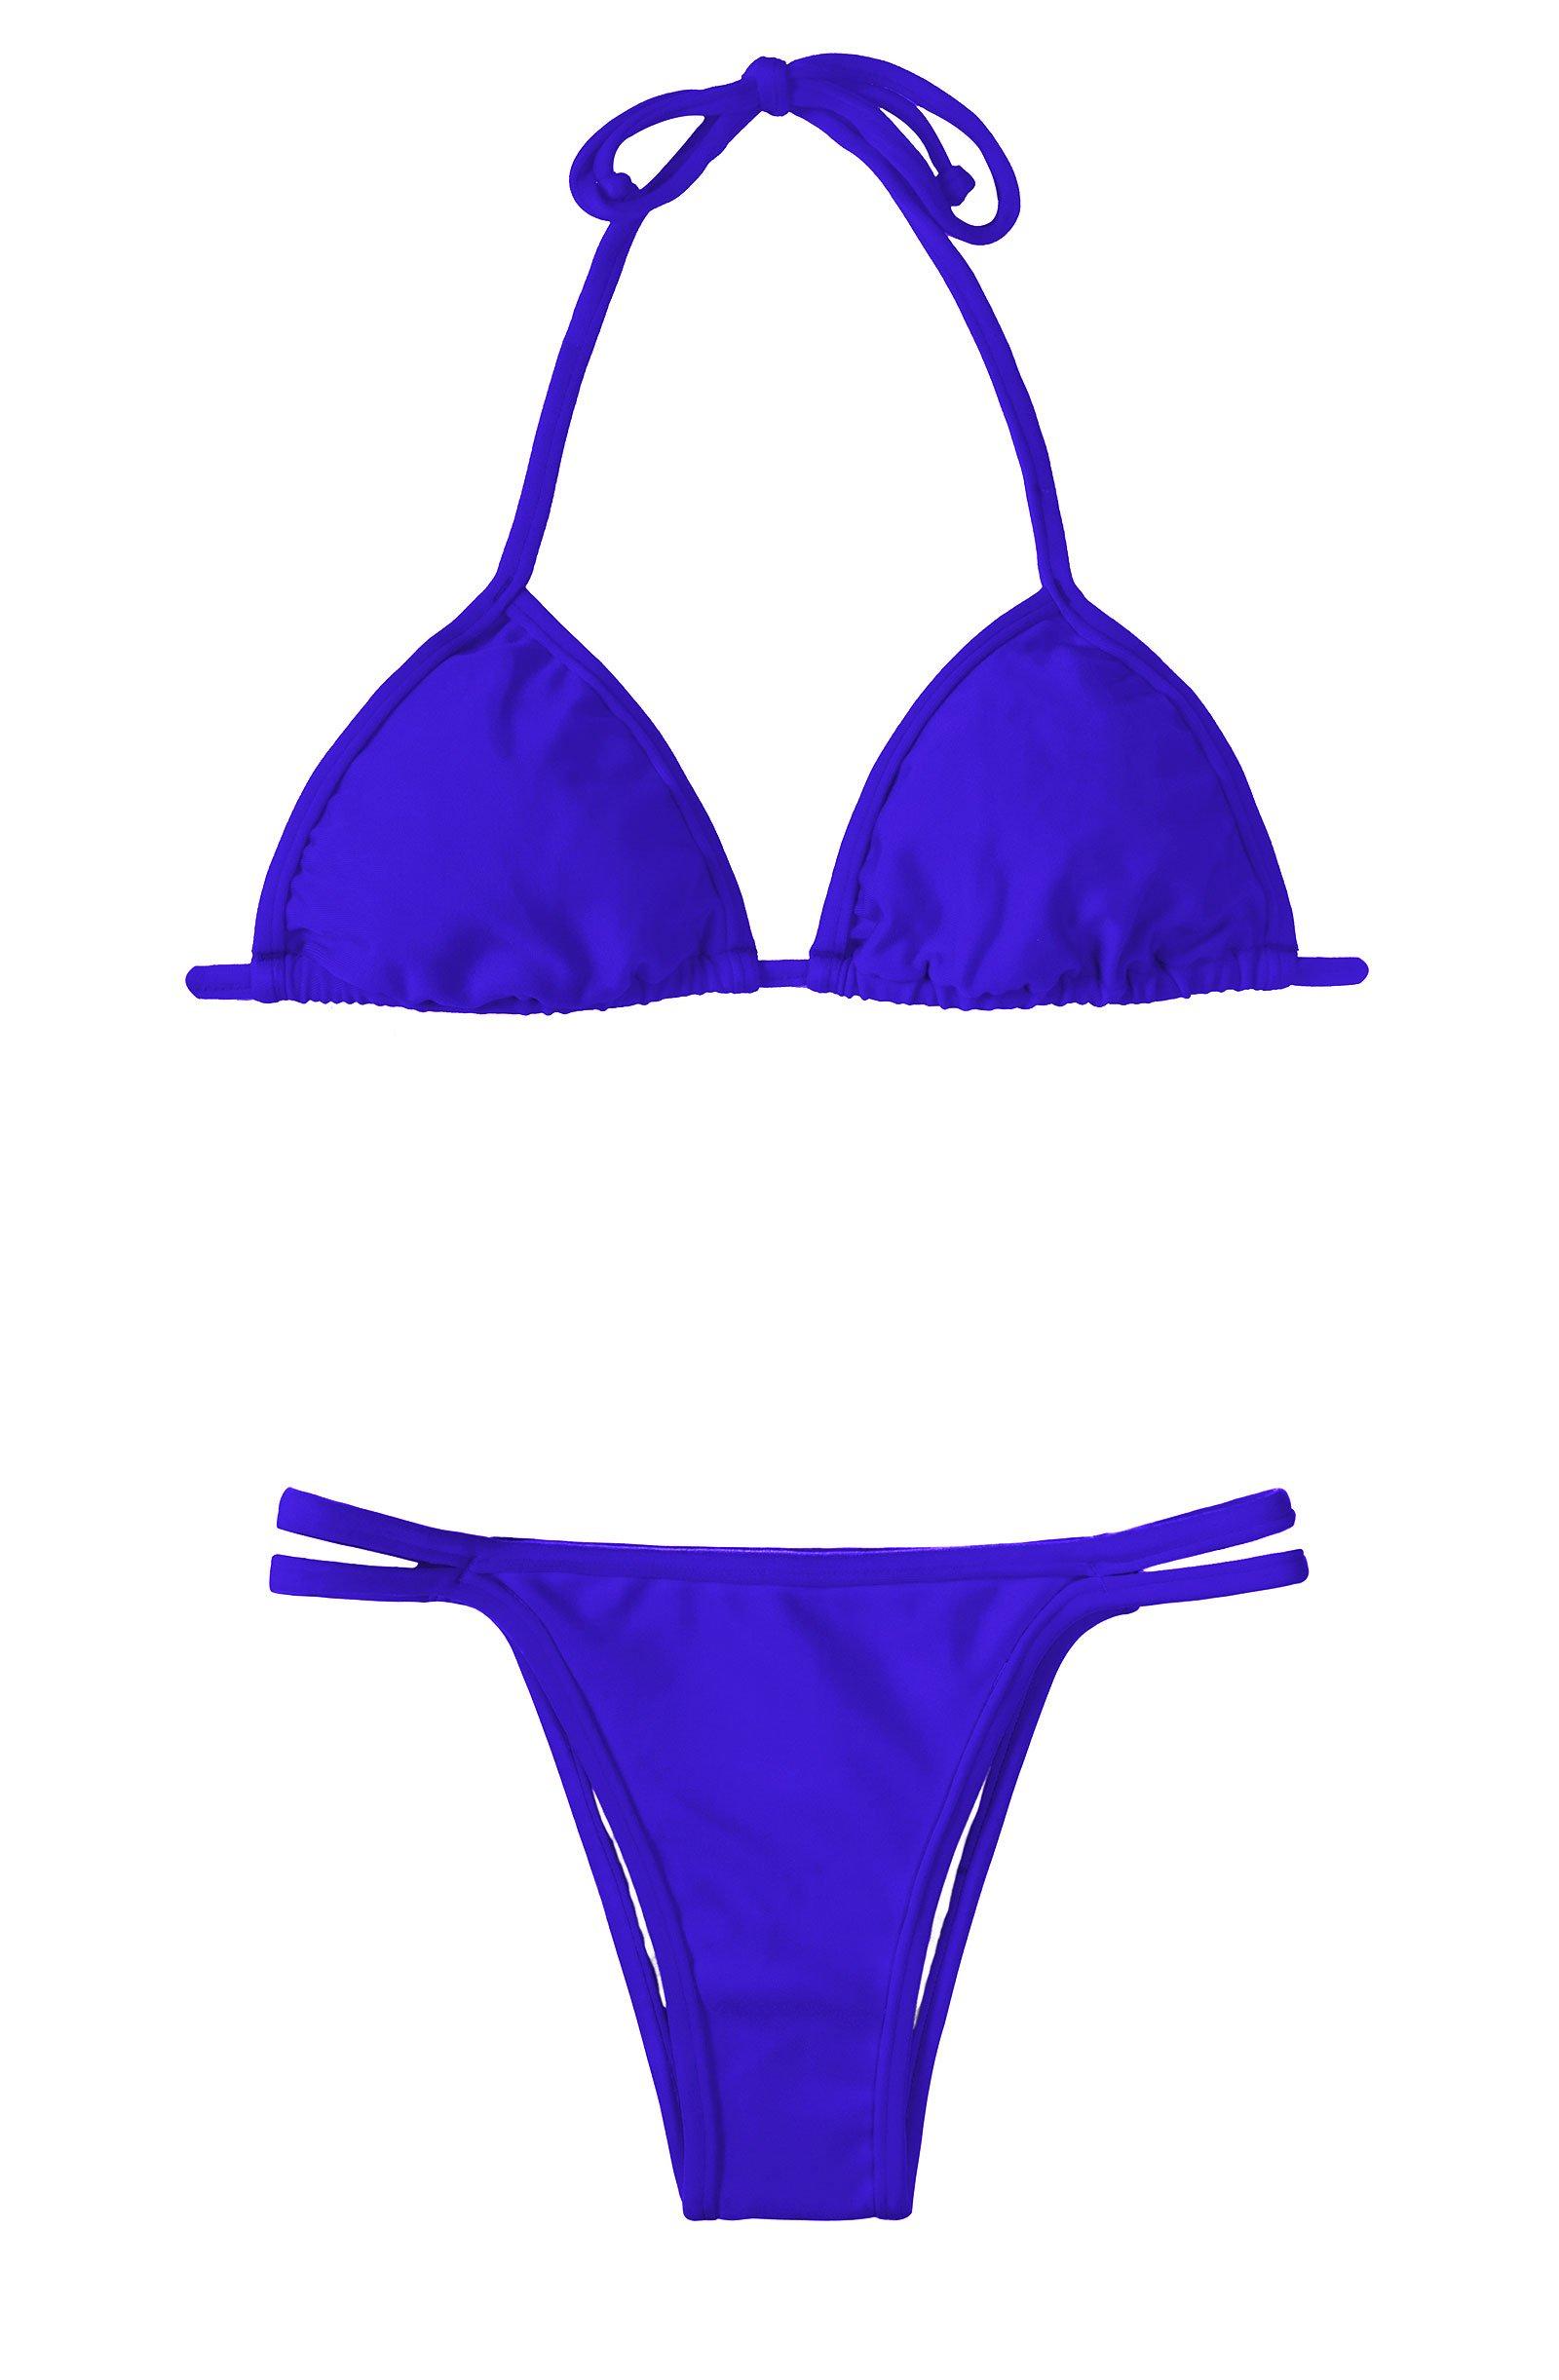 rich blue triangle bikini bottom with double fixed ties   zaffiro cort duo